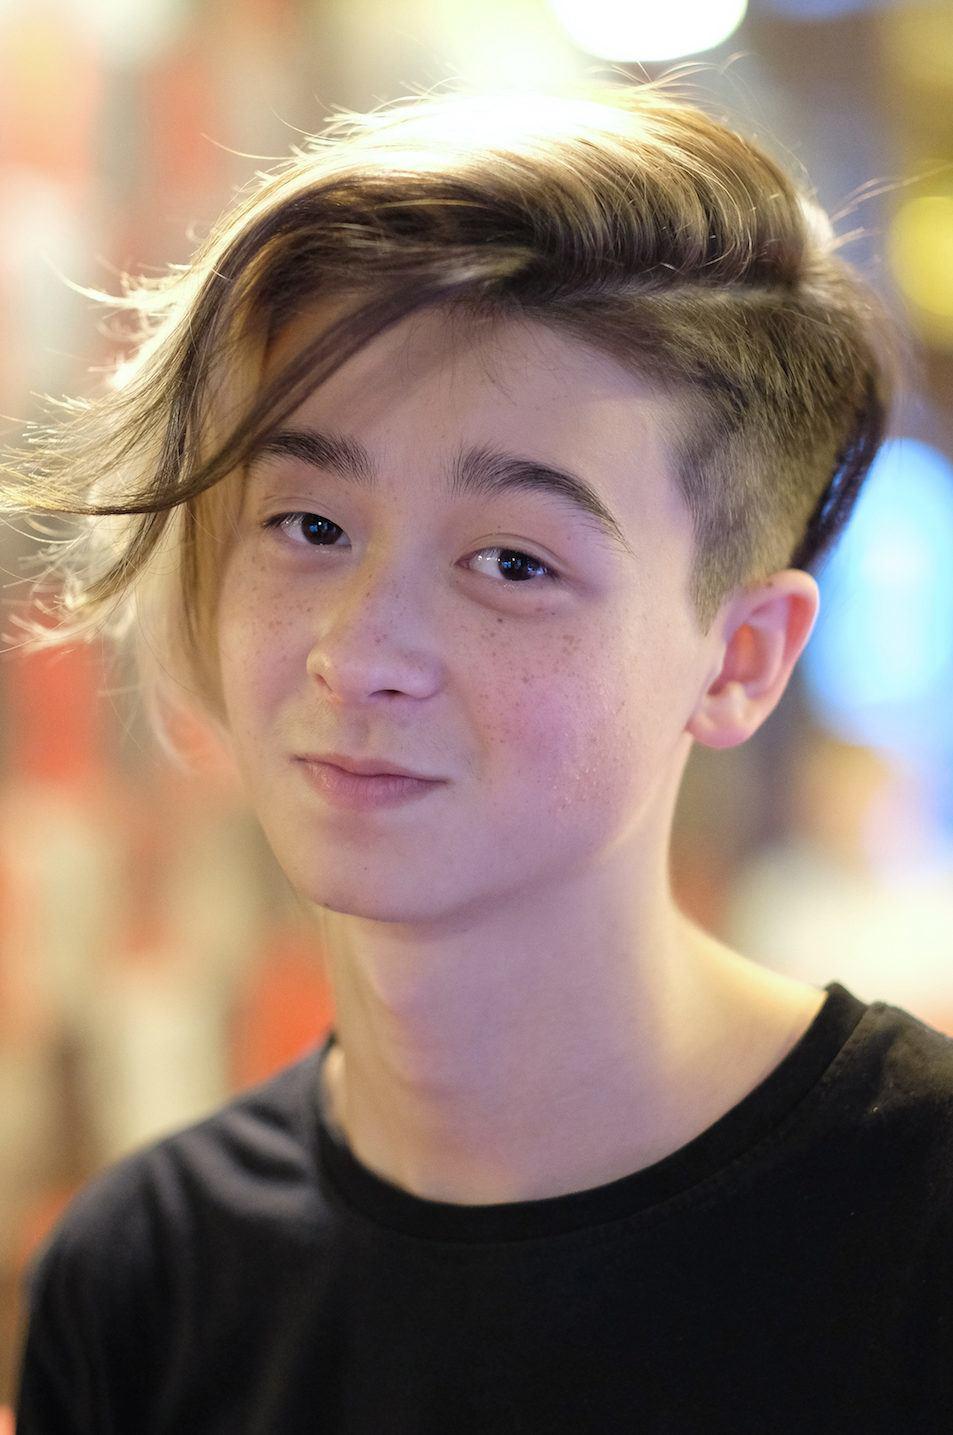 Pria asia dengan model rambut belah samping medium undercut